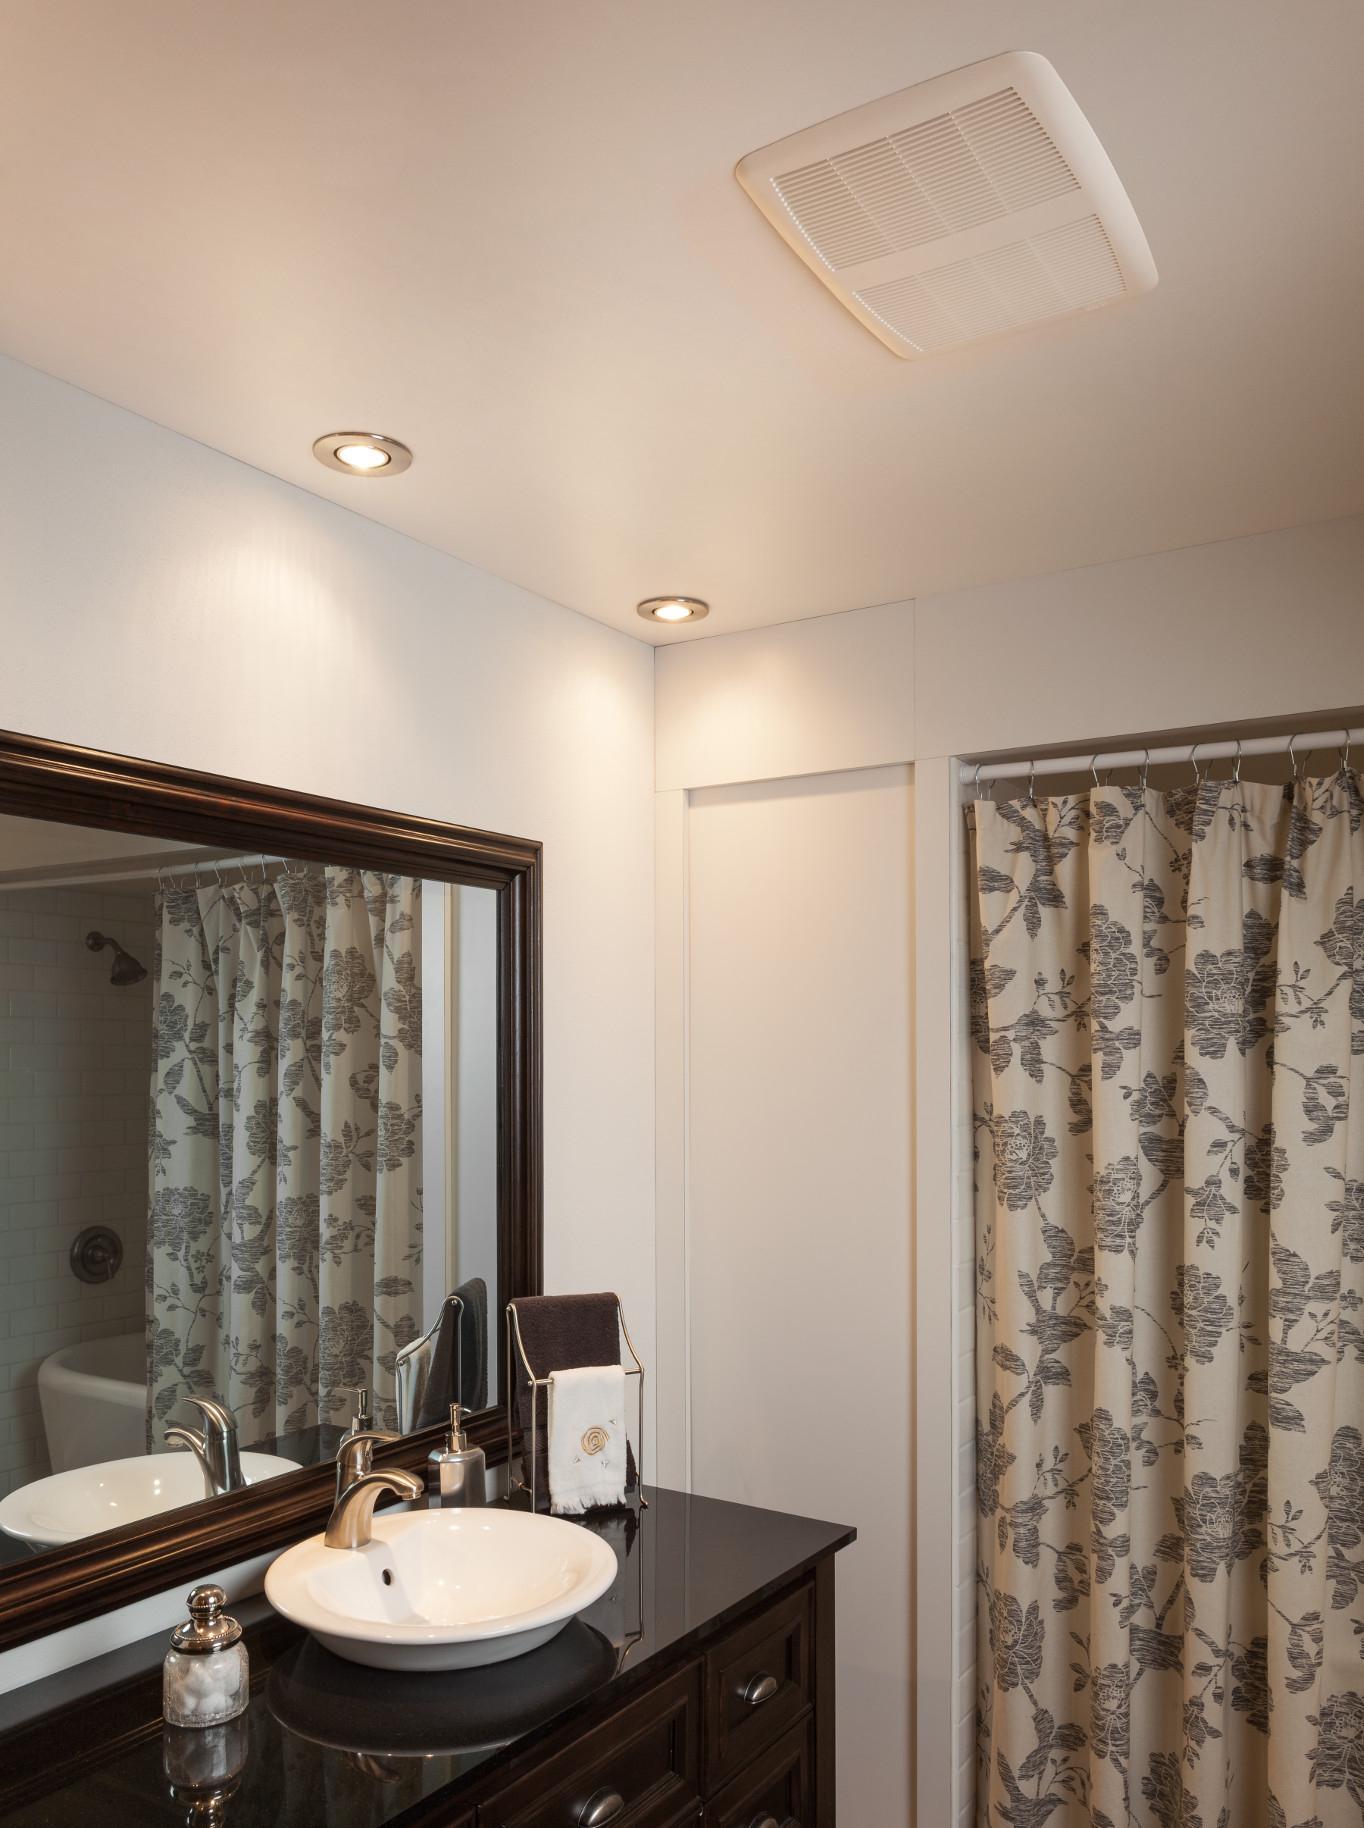 NuTone QT CFM Quiet Test Bath Fan Bathroom Ventilation - Nutone scovill bathroom fan for bathroom decor ideas